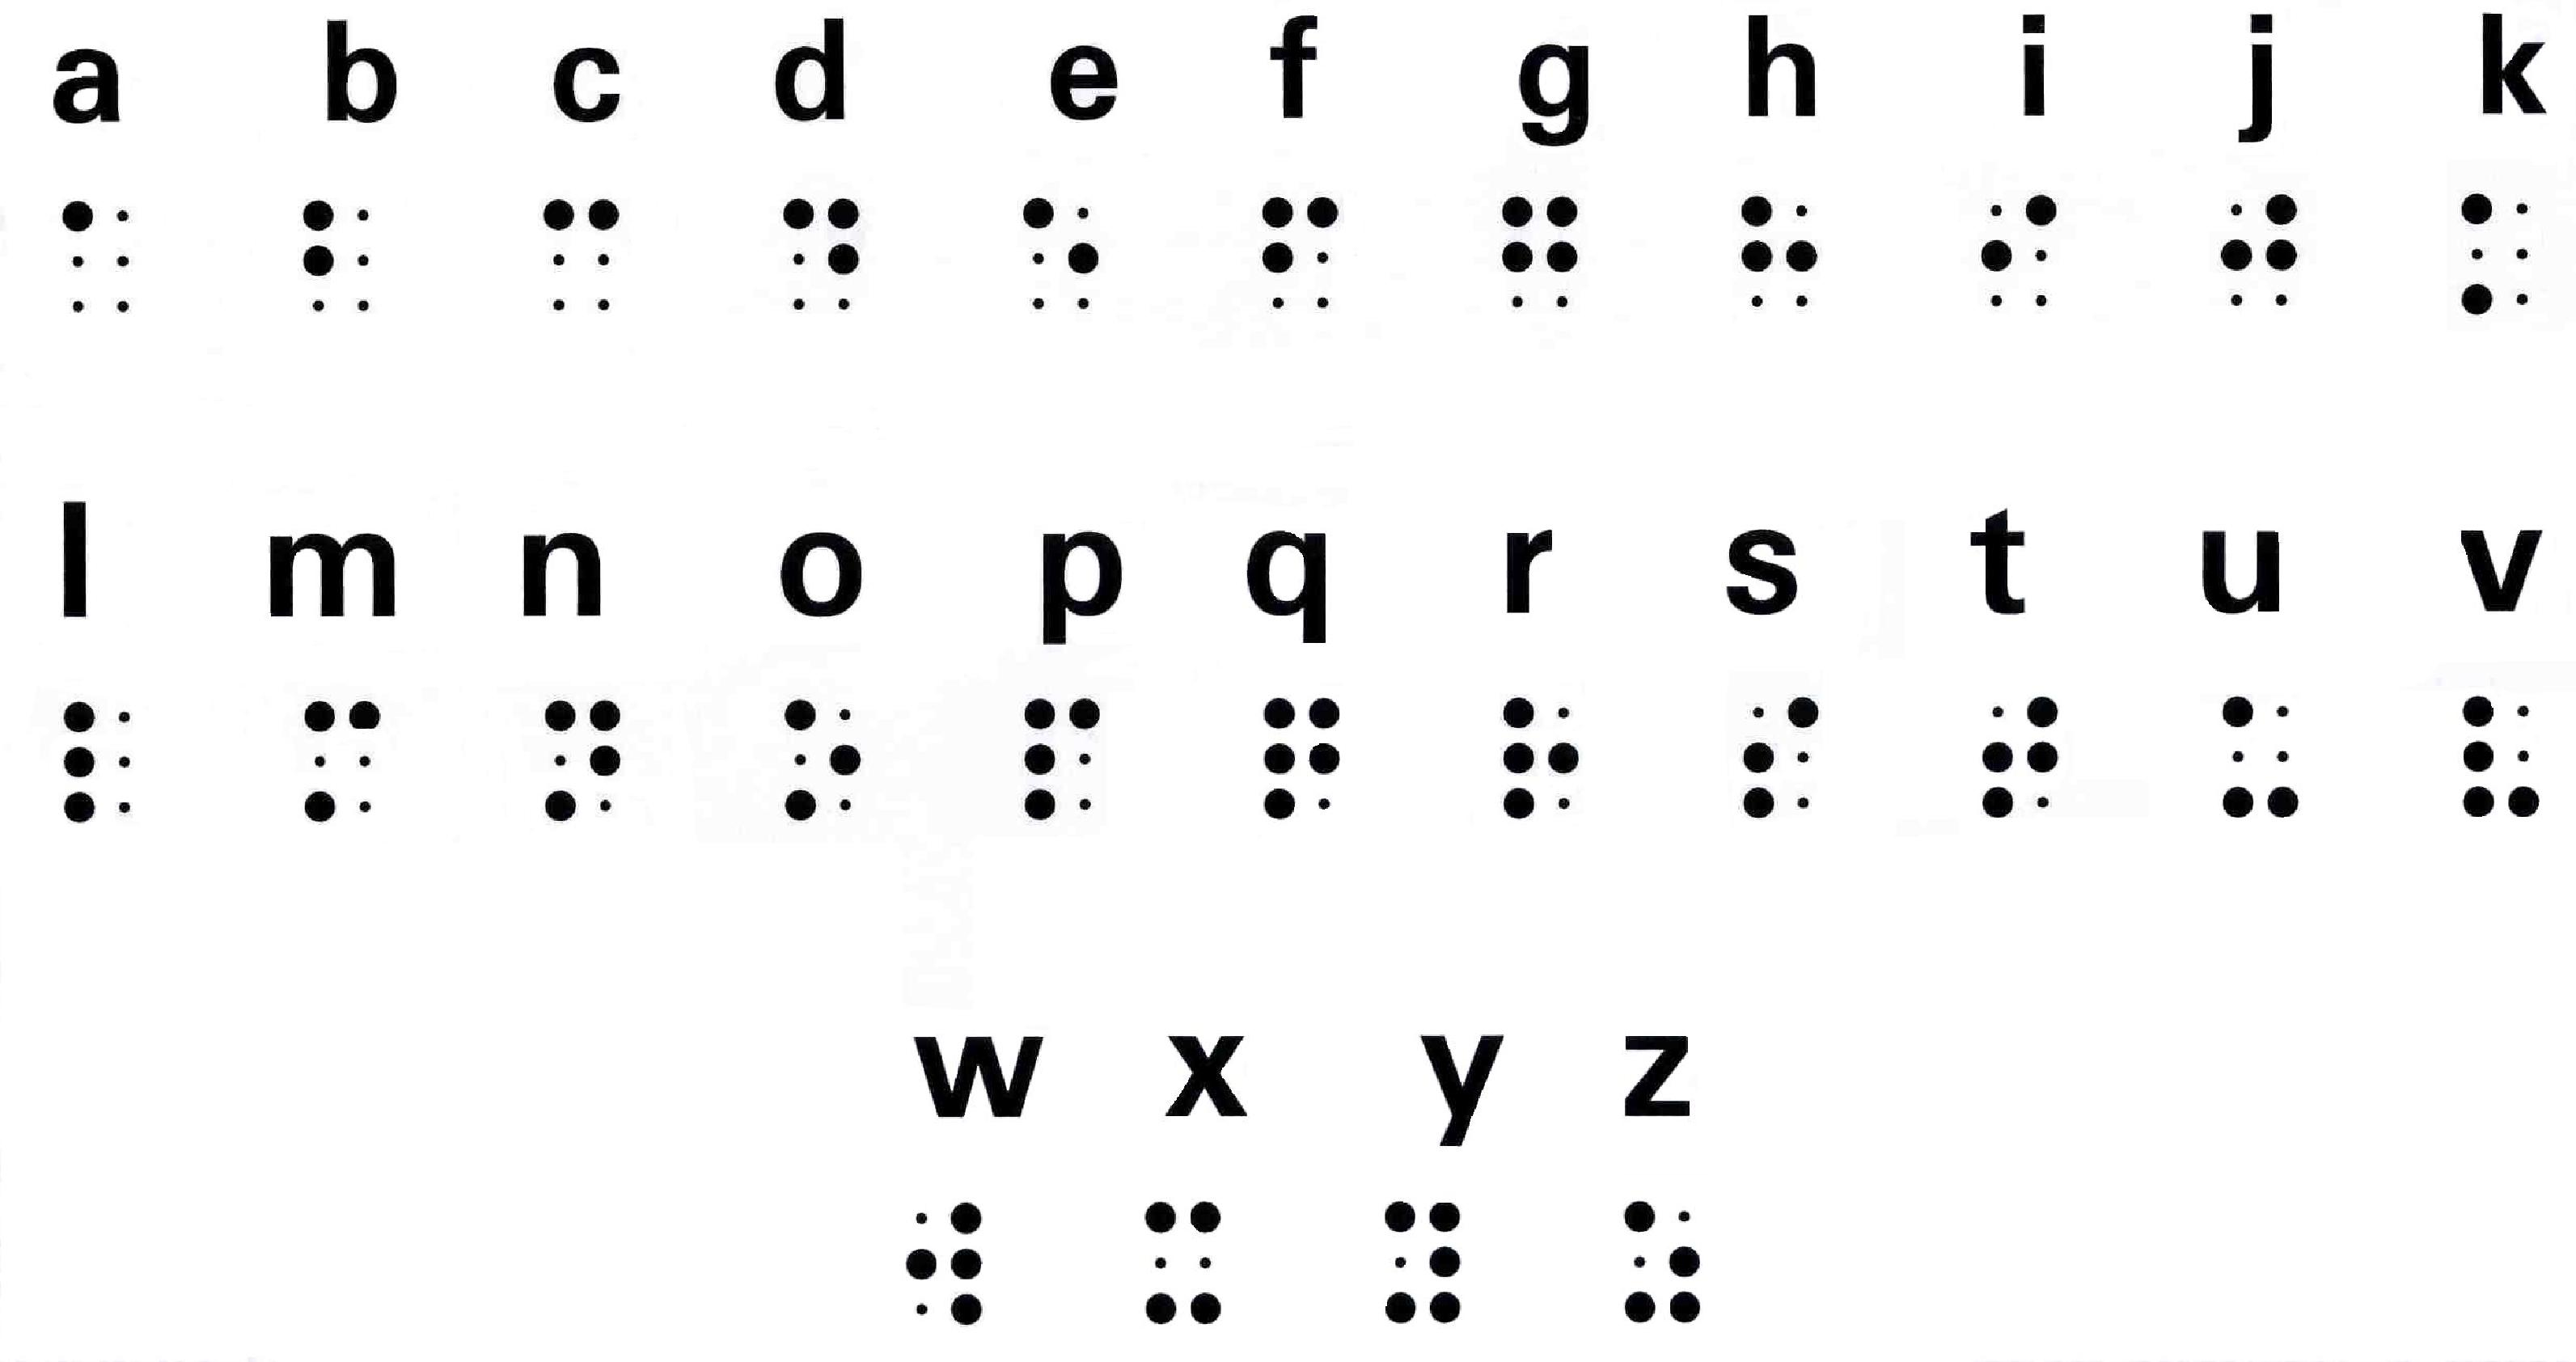 Abecedario Braille